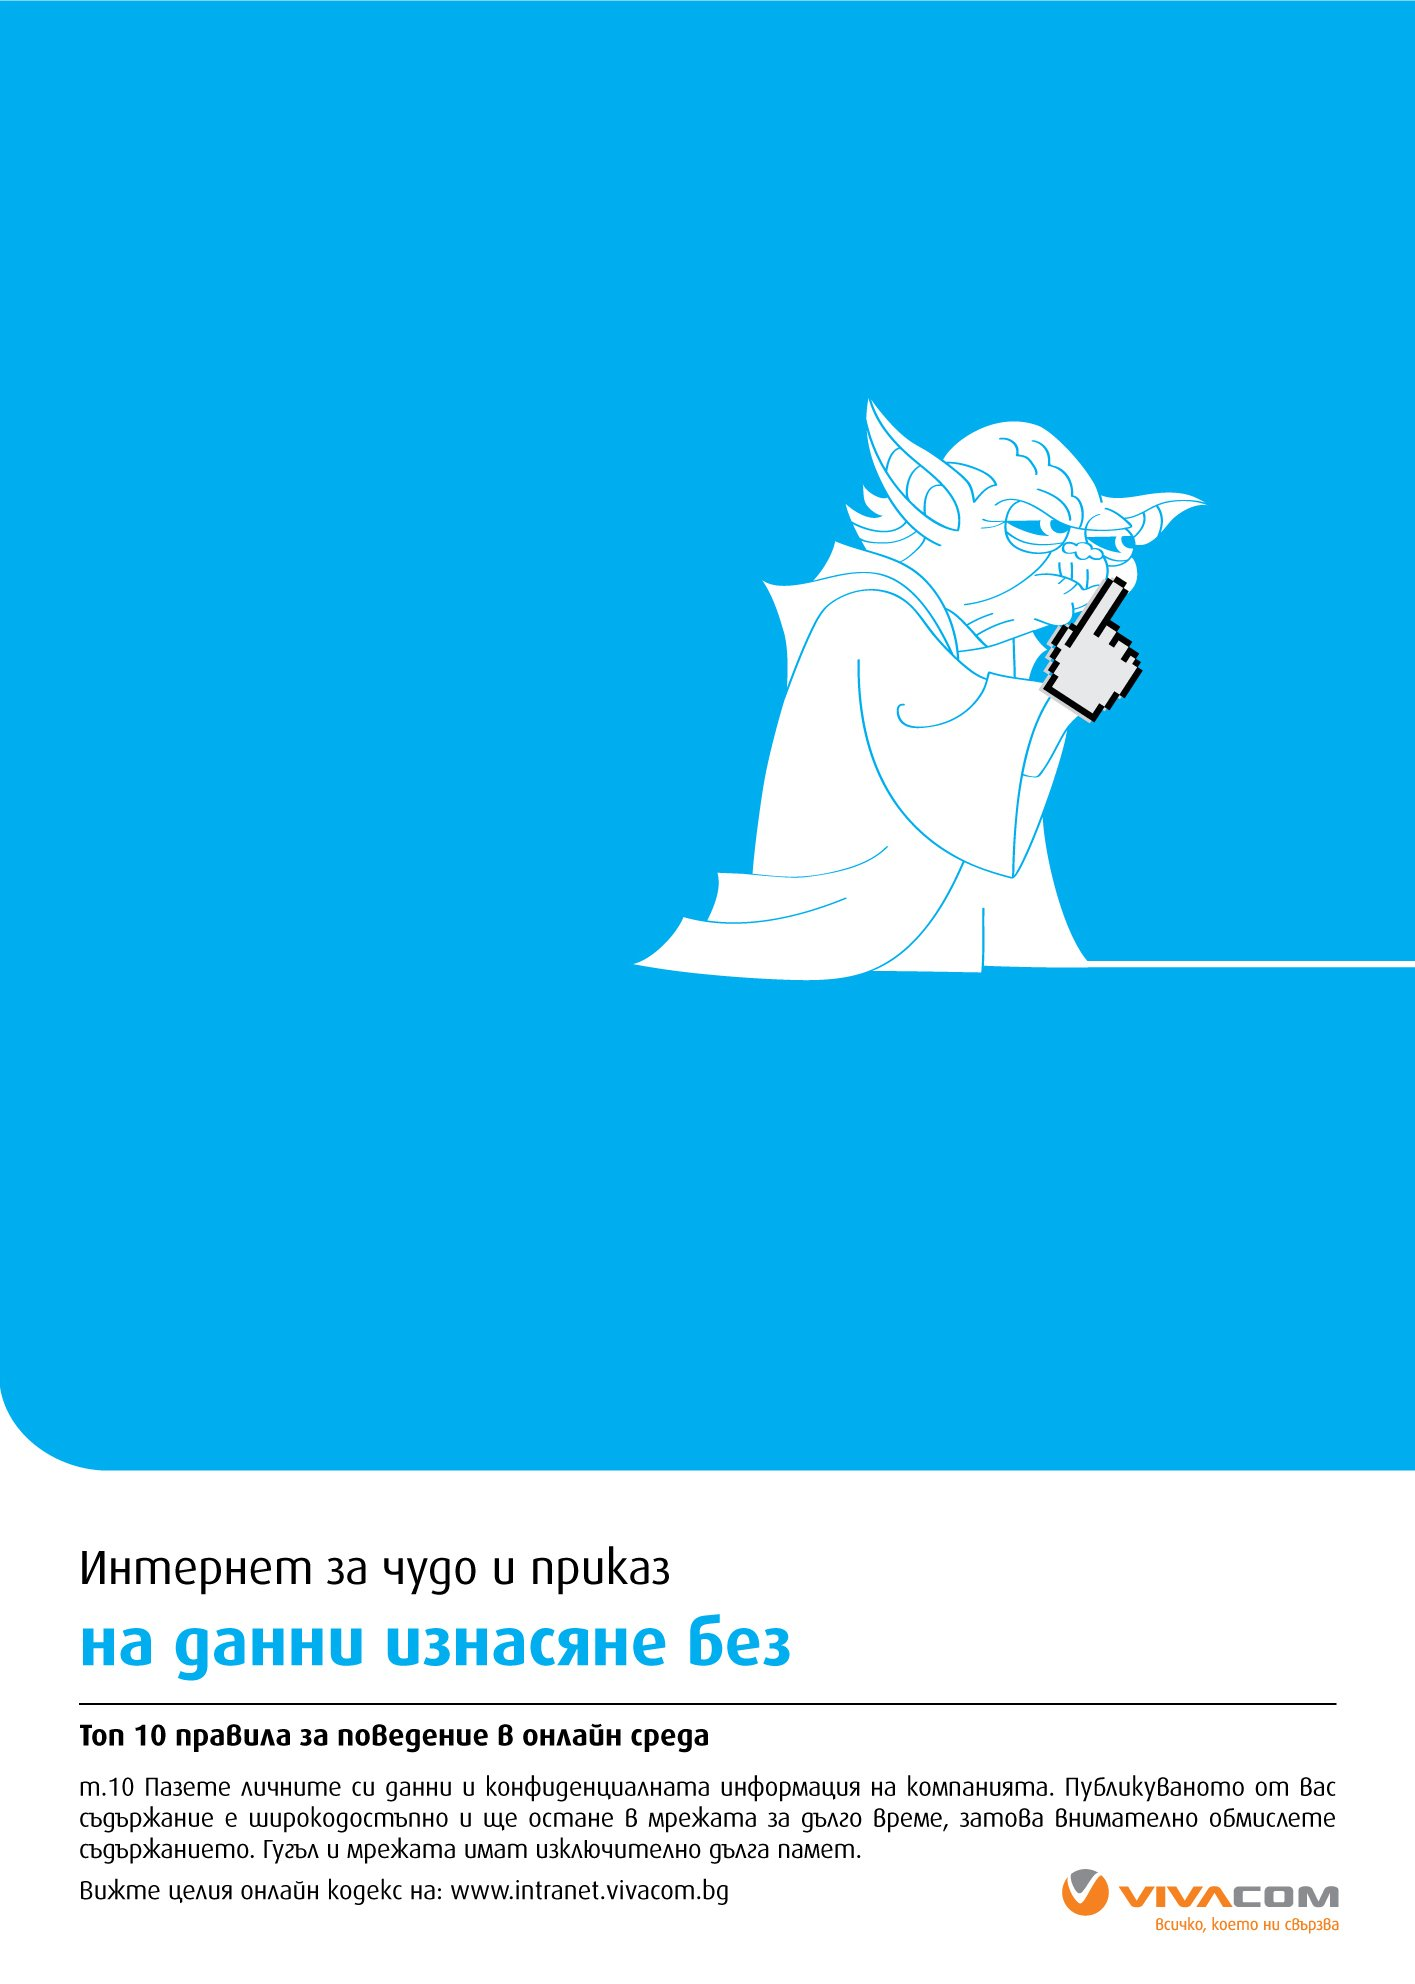 Vivacom – Corporate campaign